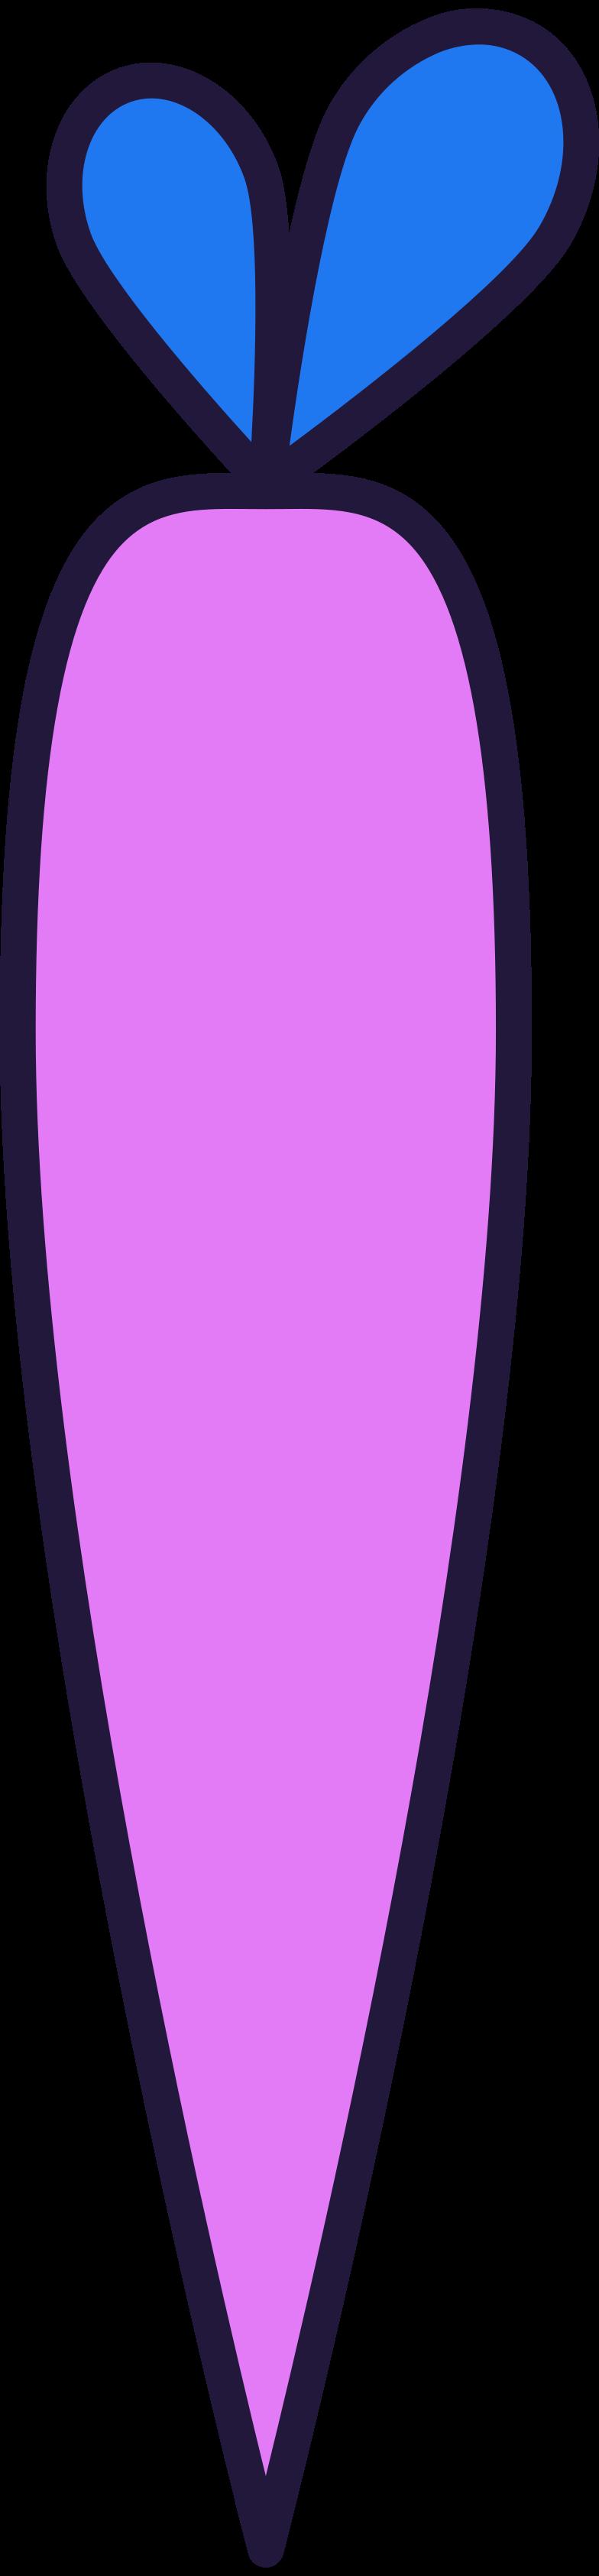 l carrot Clipart illustration in PNG, SVG